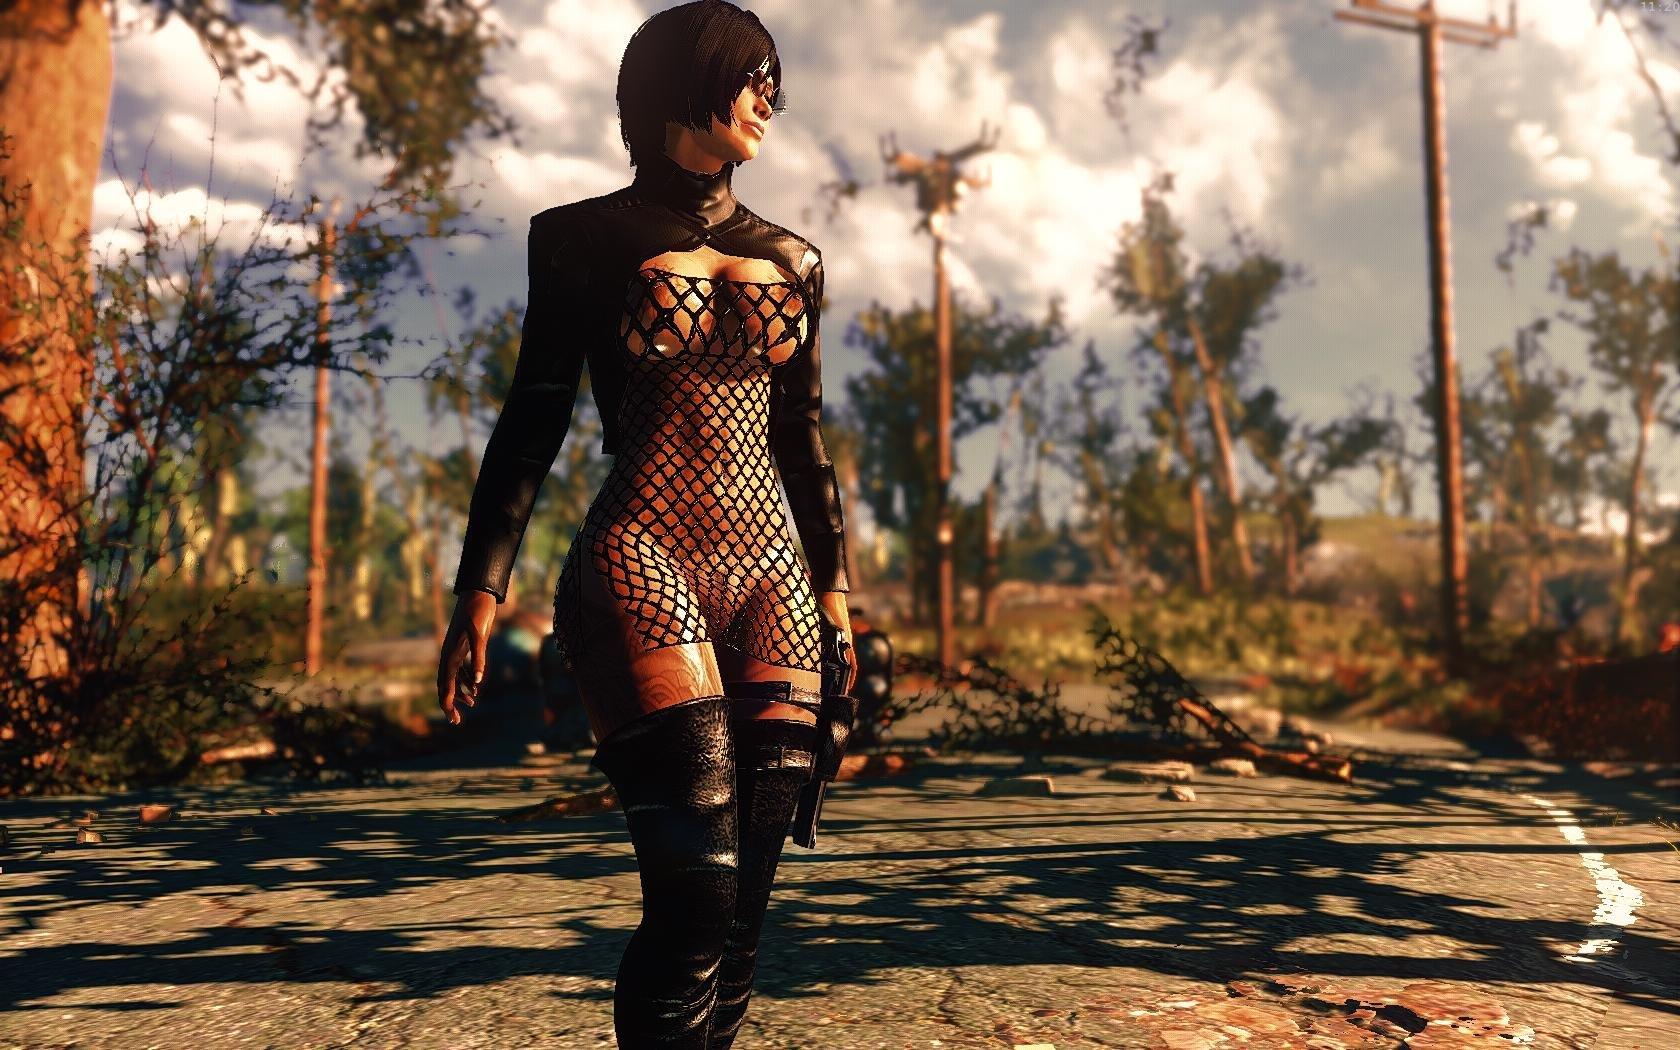 Fallout4 2019-02-22 11-20-16-24